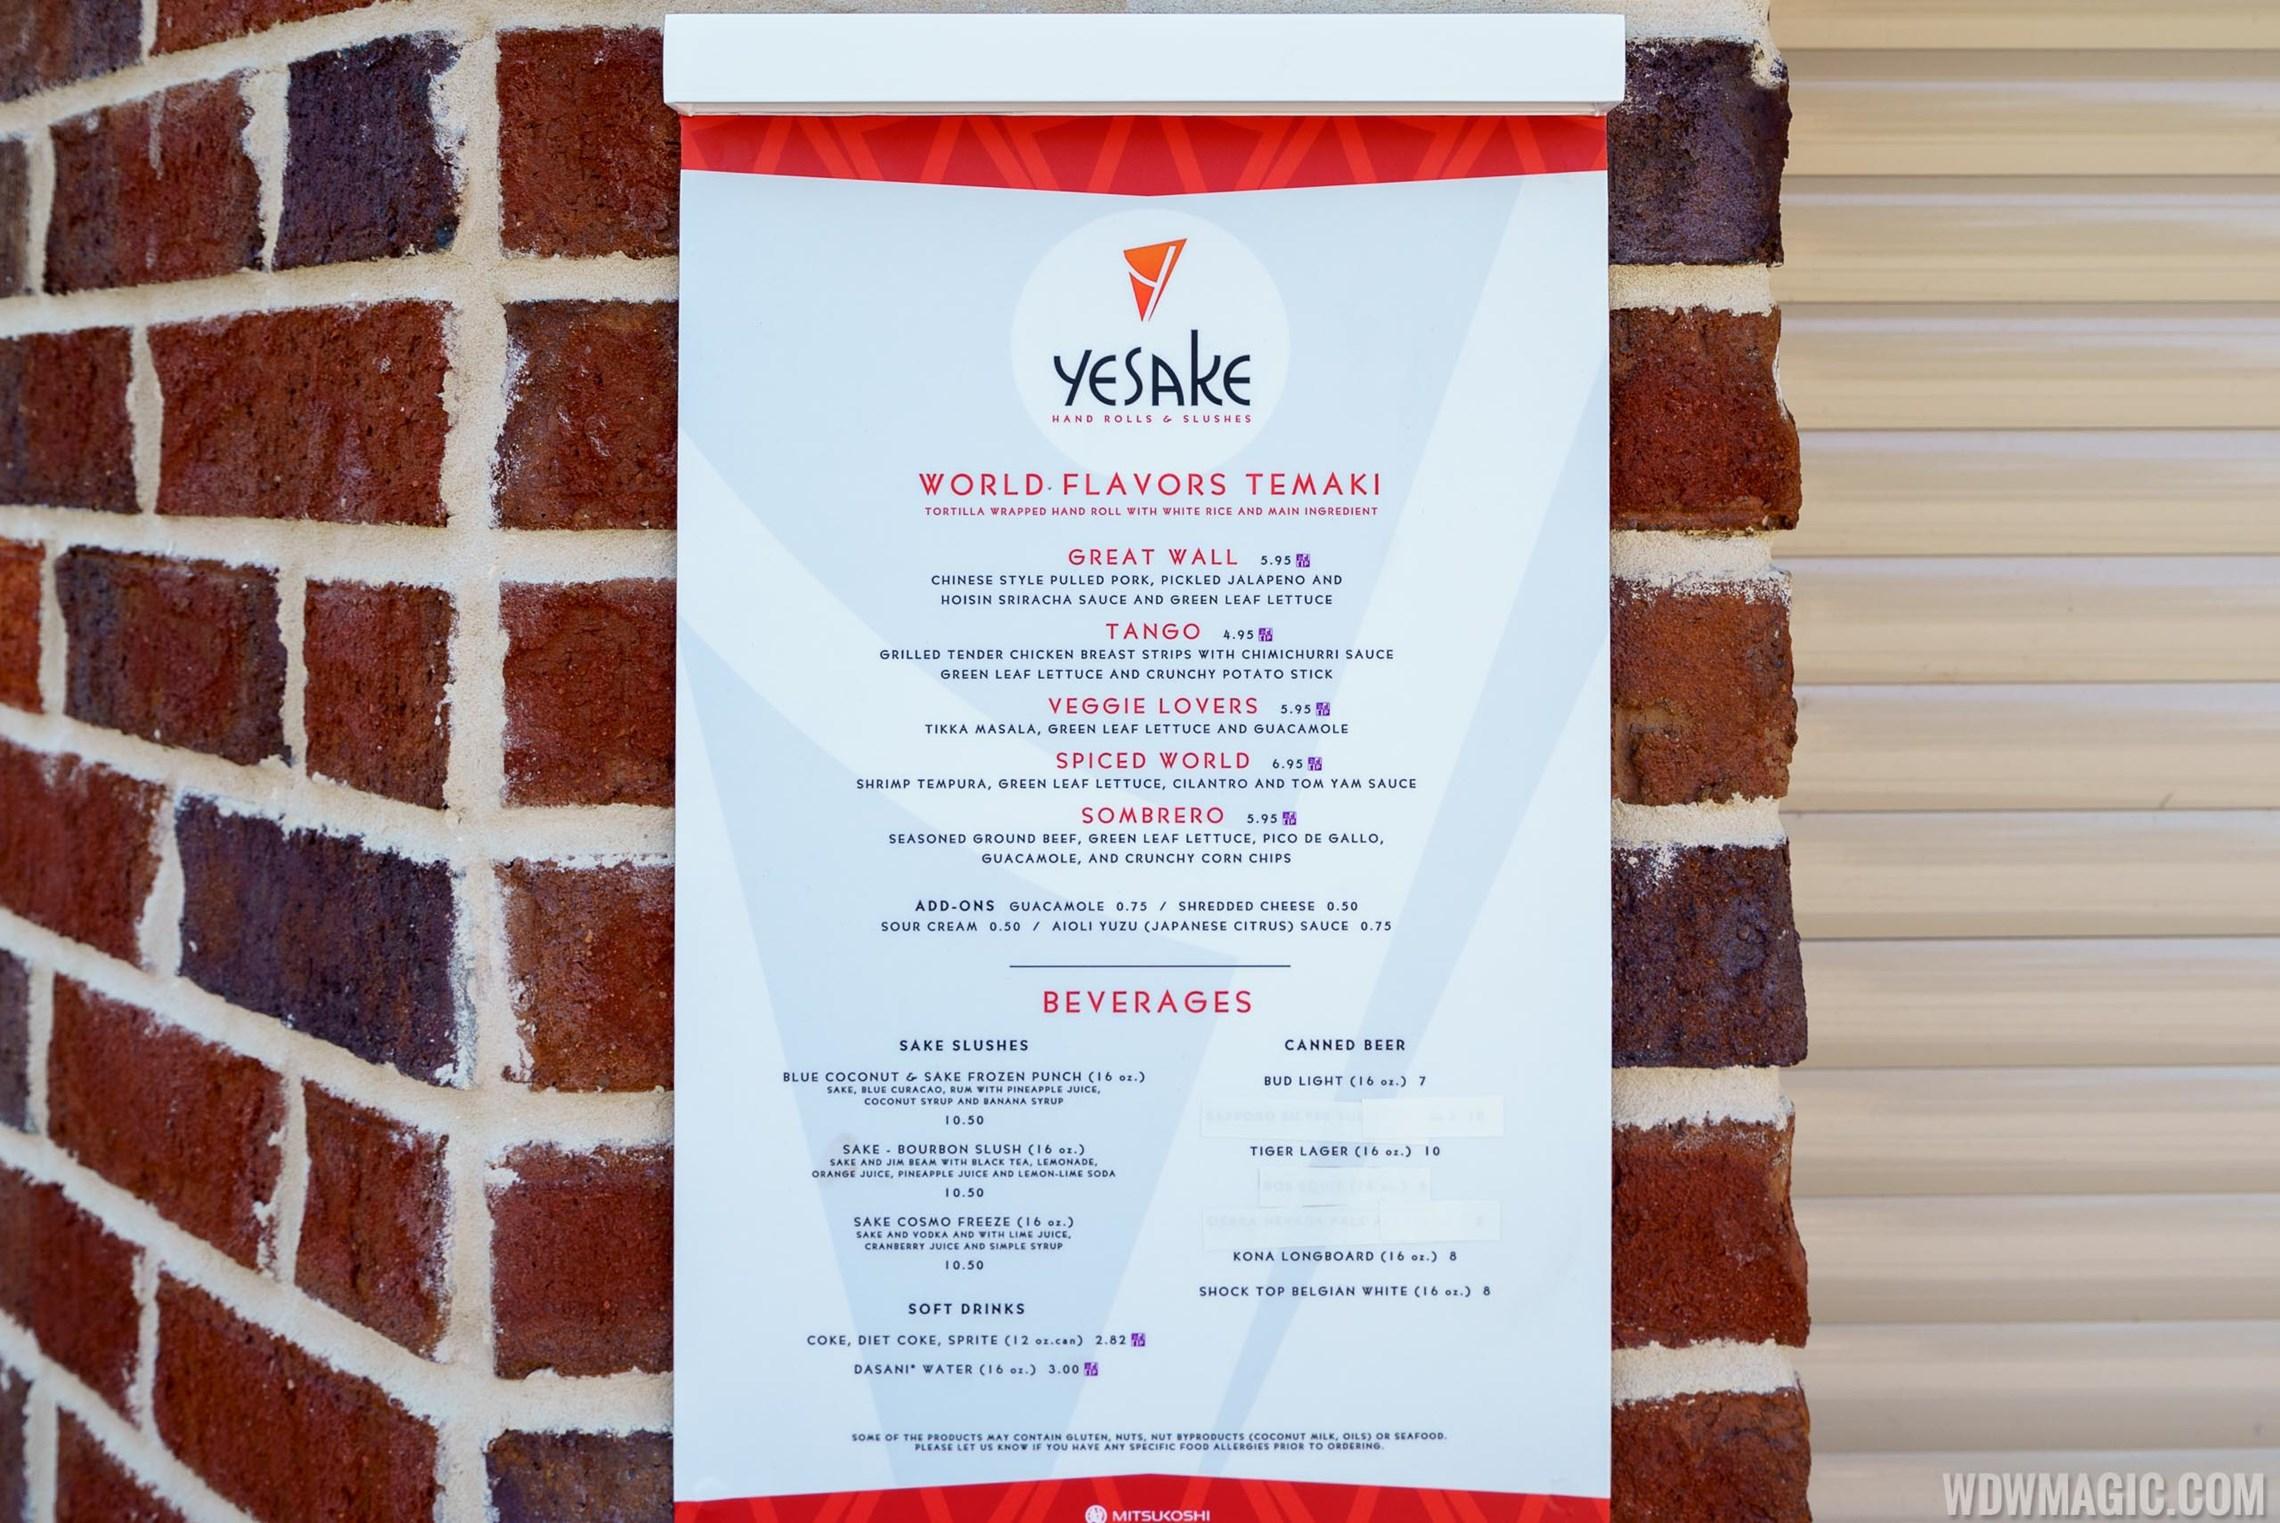 YeSake Hand Rolls and Slushes overview